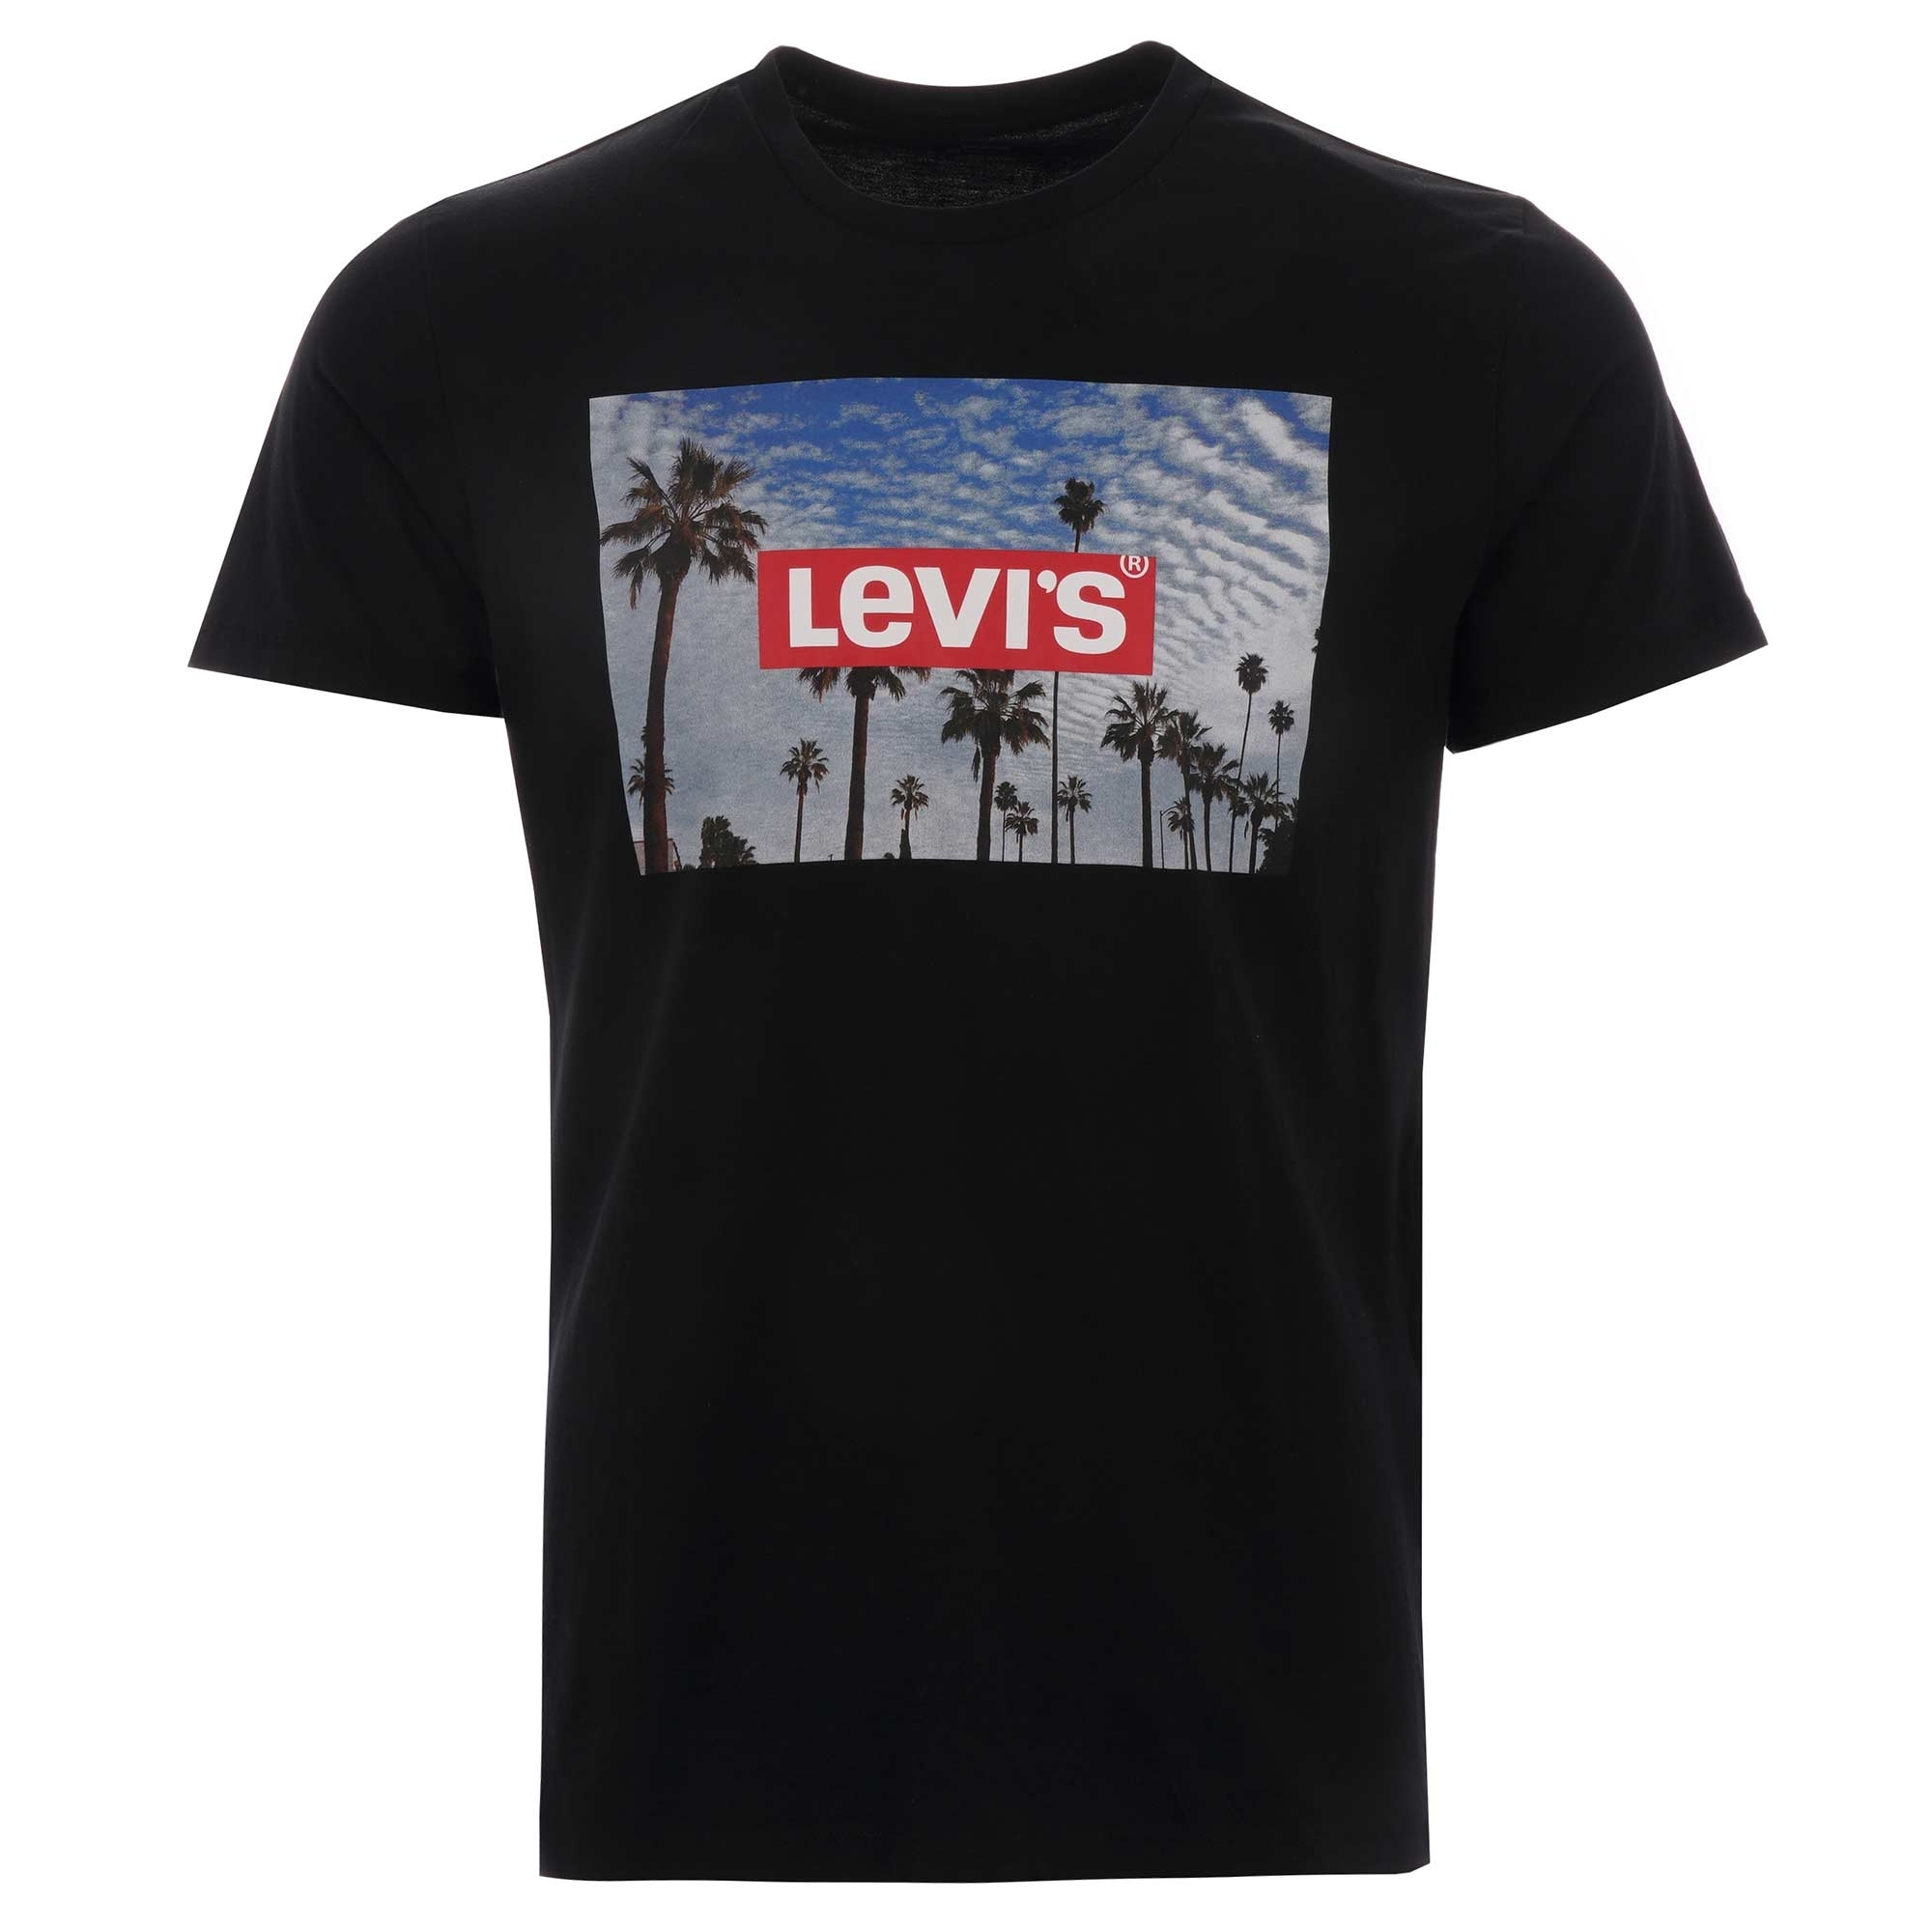 4f2884cffbc1 Levi's Classic Graphic T-Shirt | Black | 224910491